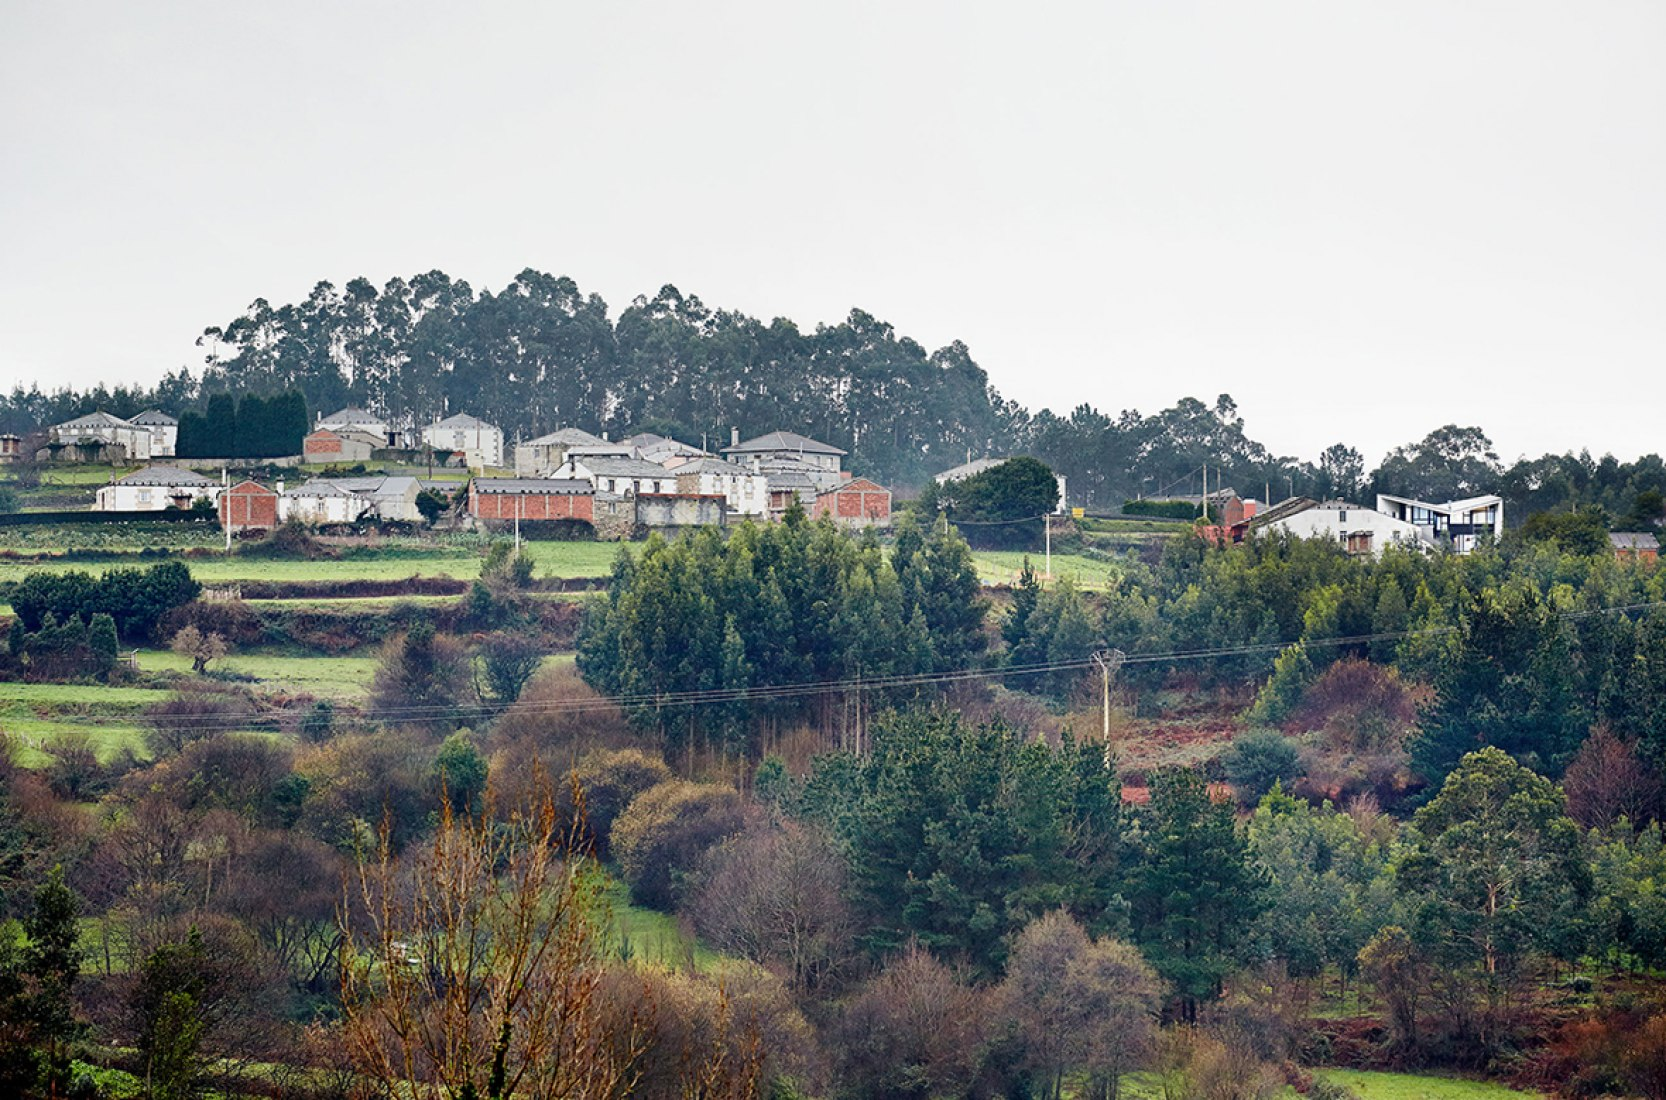 Surrounding. Vacation home in Vilapol by padilla nicás arquitectos. Photography © José Hevia Blach.